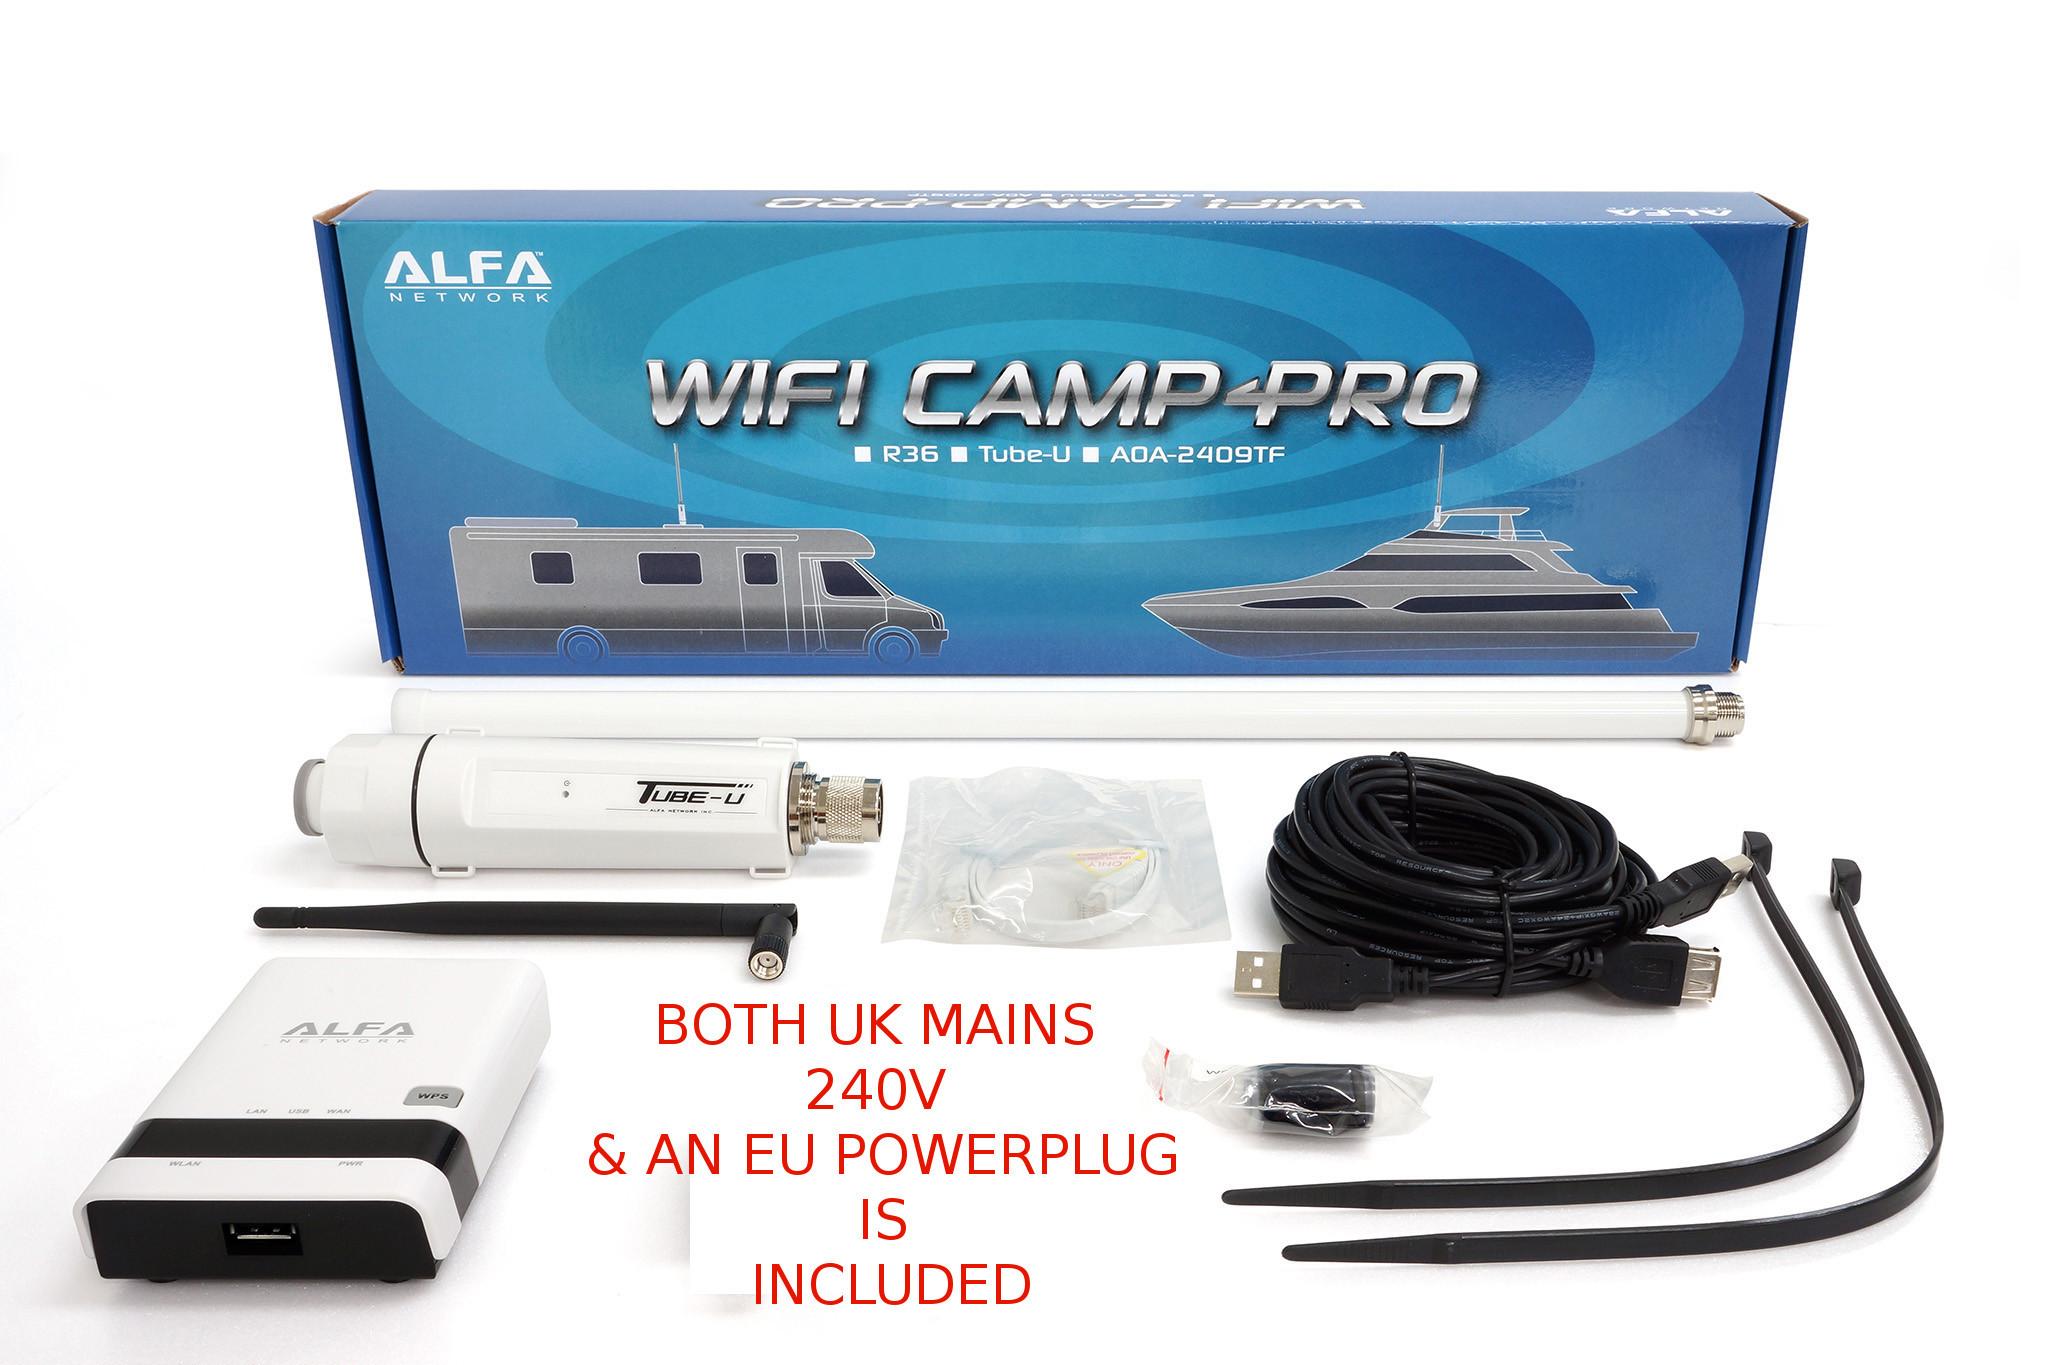 Alfa Network WiFi Camp-Pro G, 1 X R36 ,1 X Tube U G & 1 X